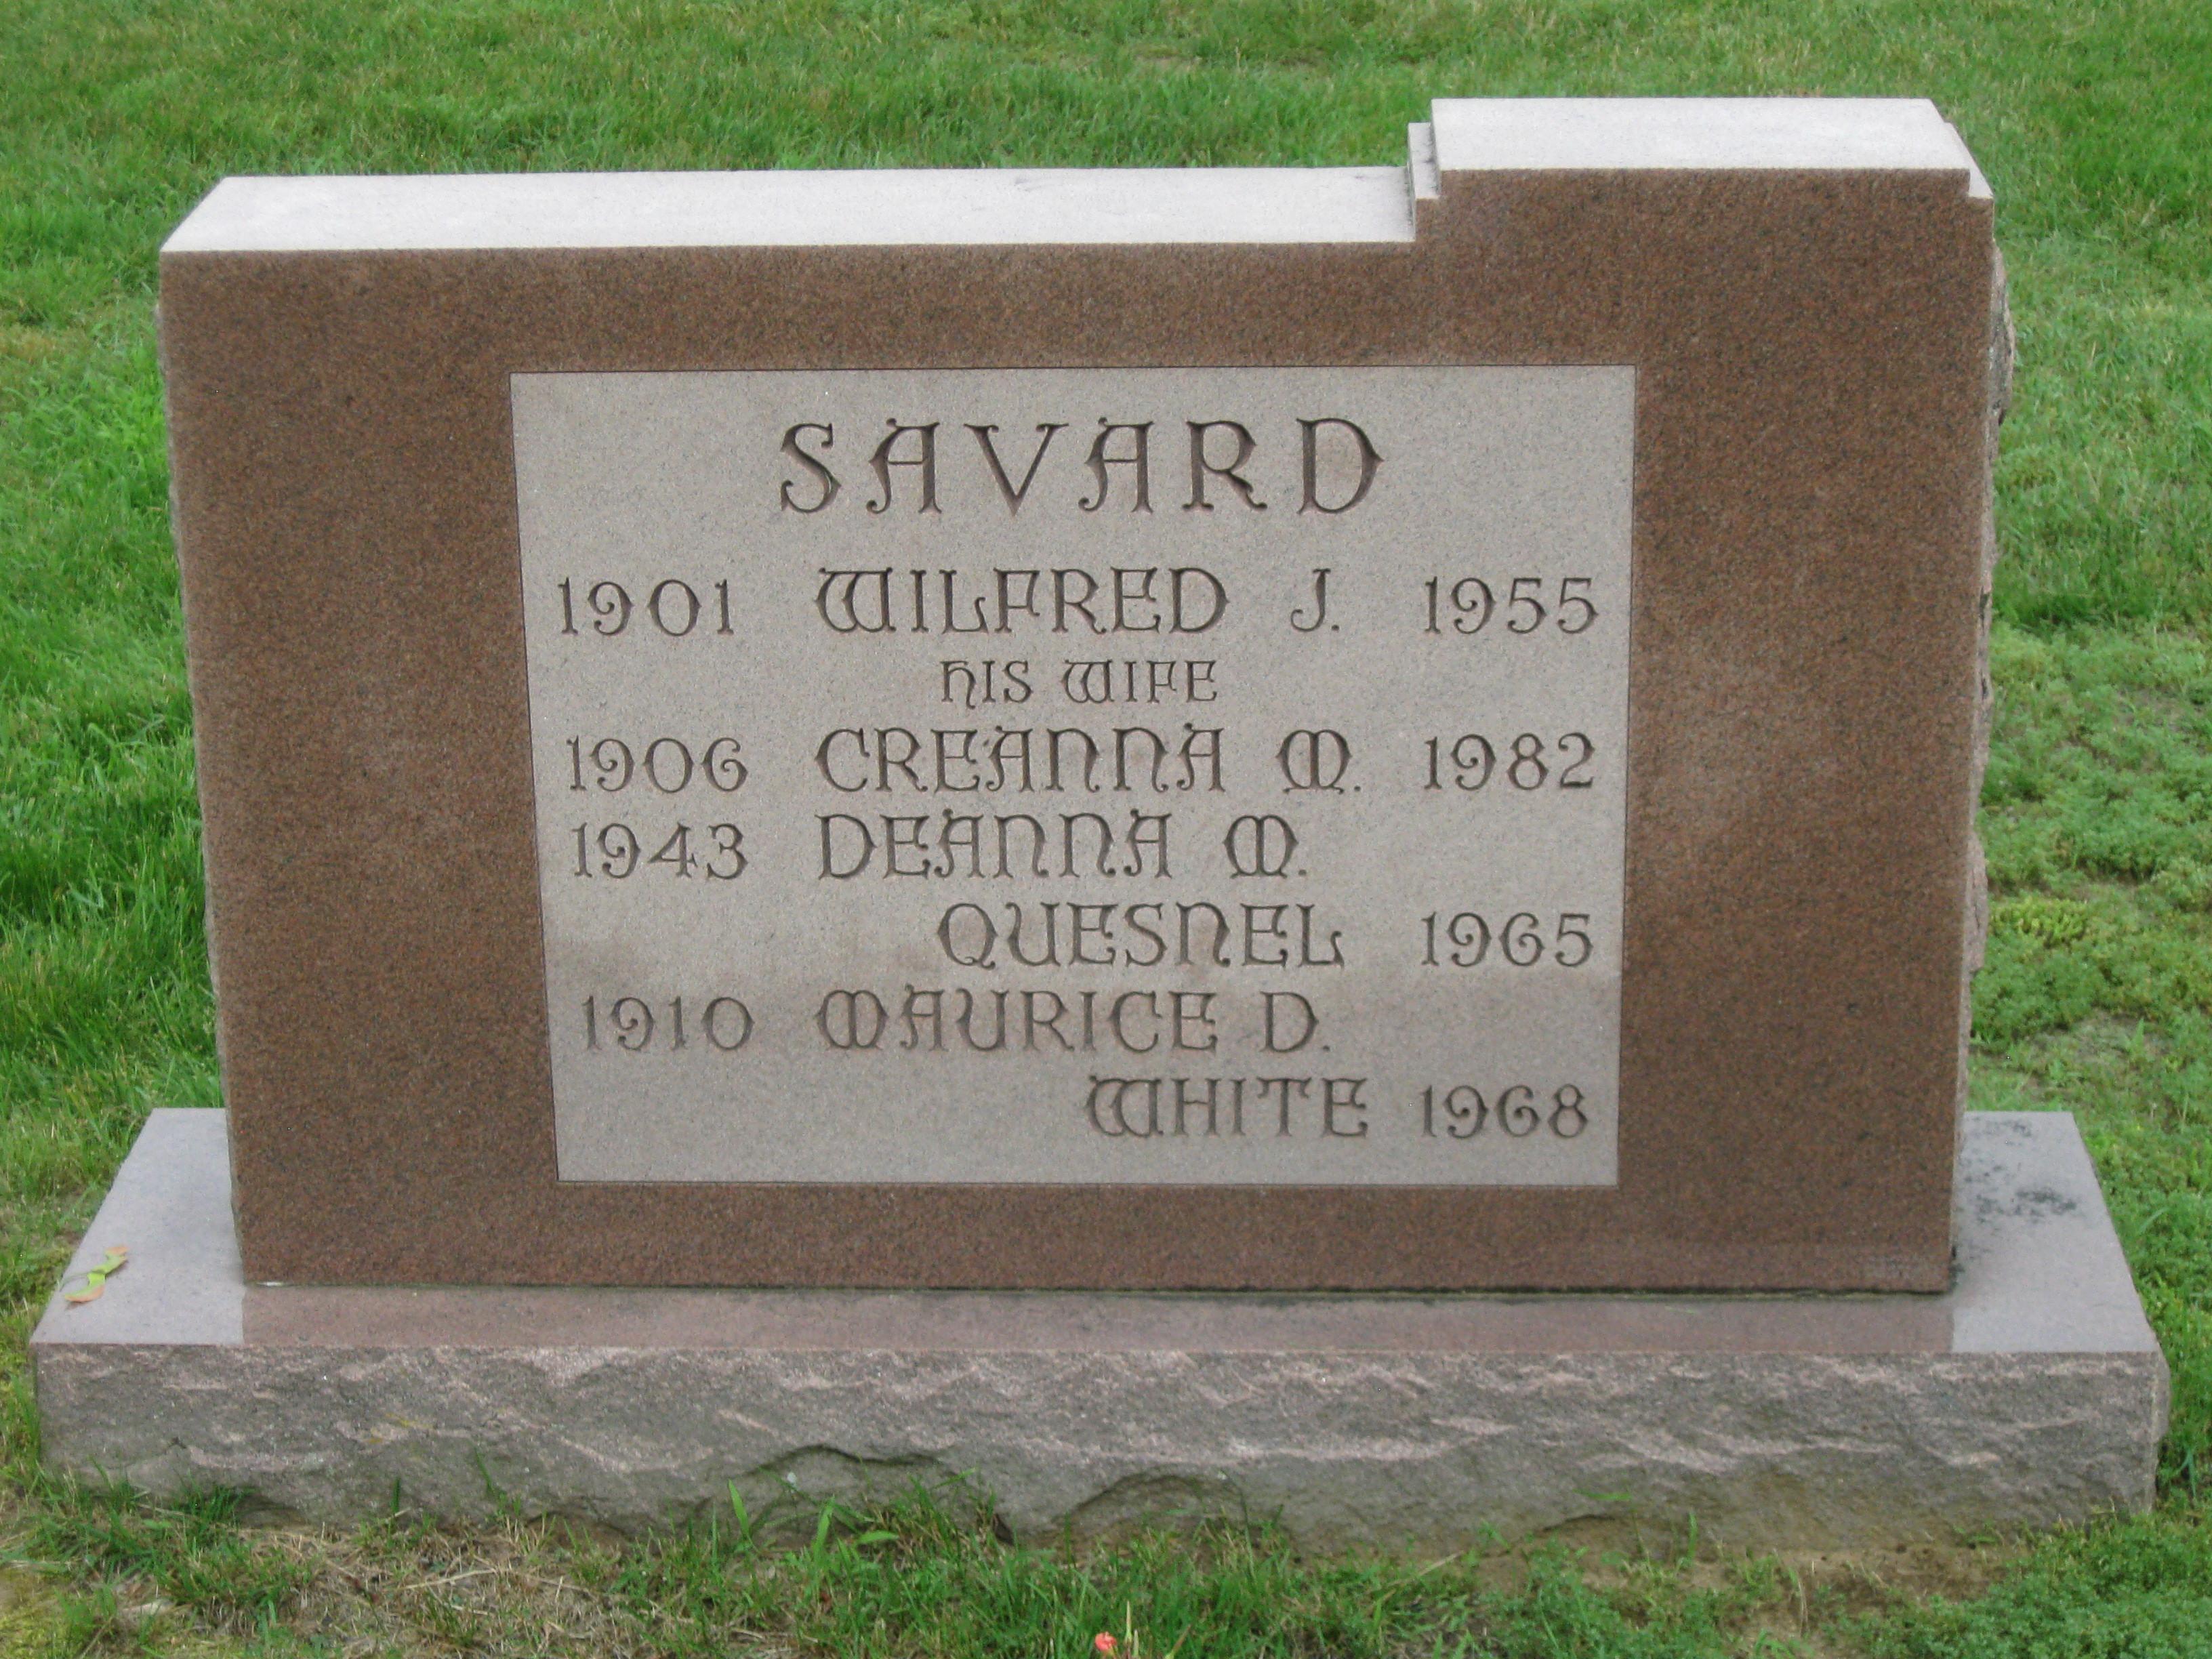 Victor Savard